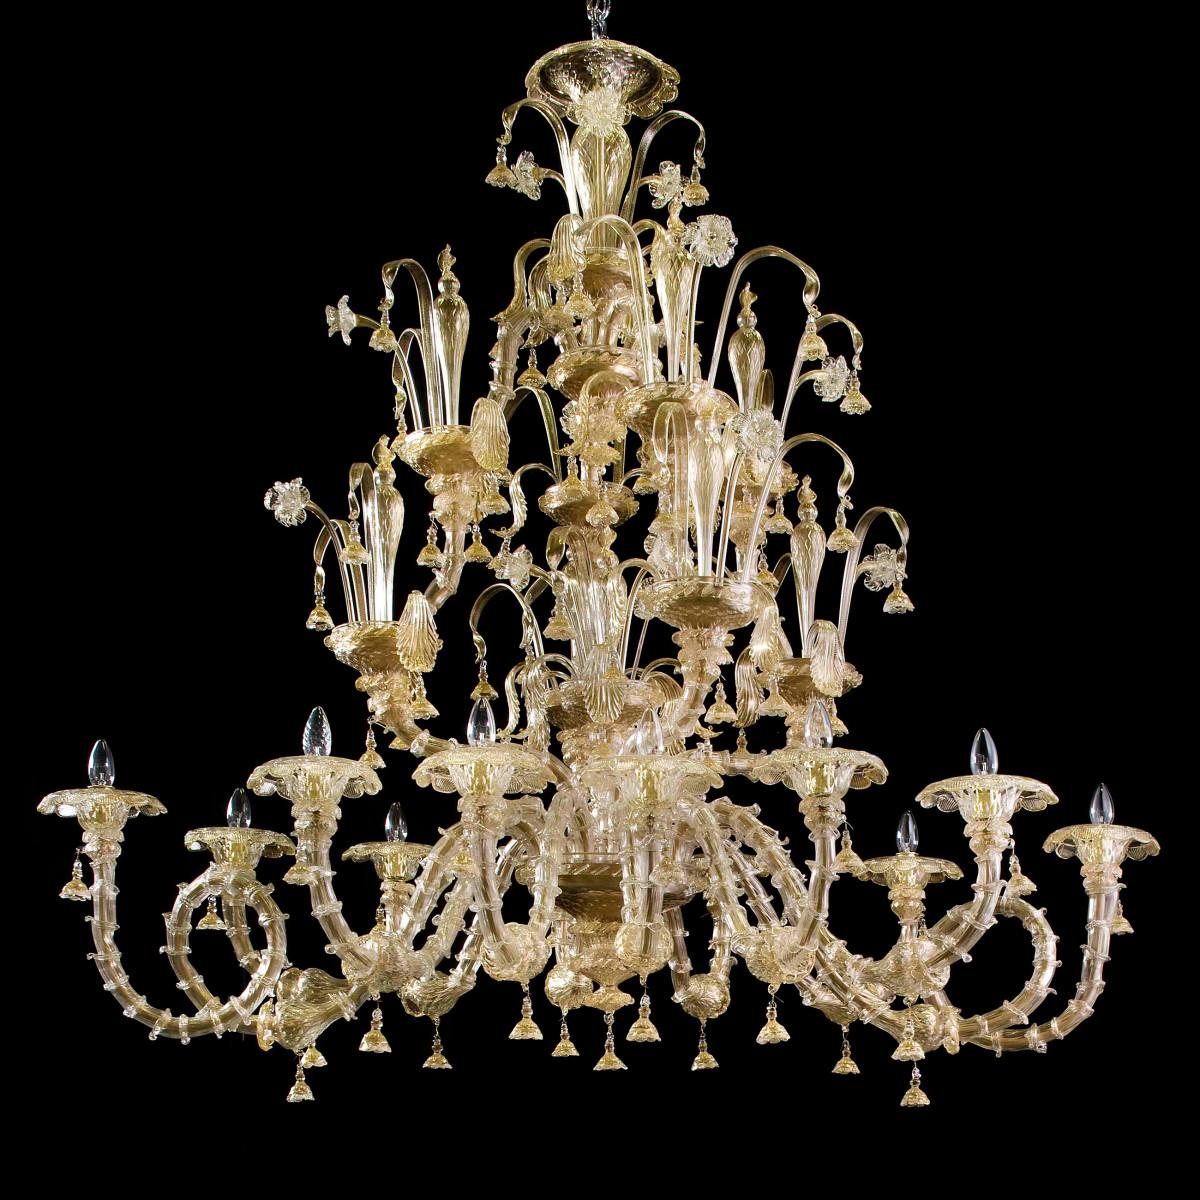 Magnifico 12 Leuchten aus Murano-Kronleuchter - ovale Form - gold farbe